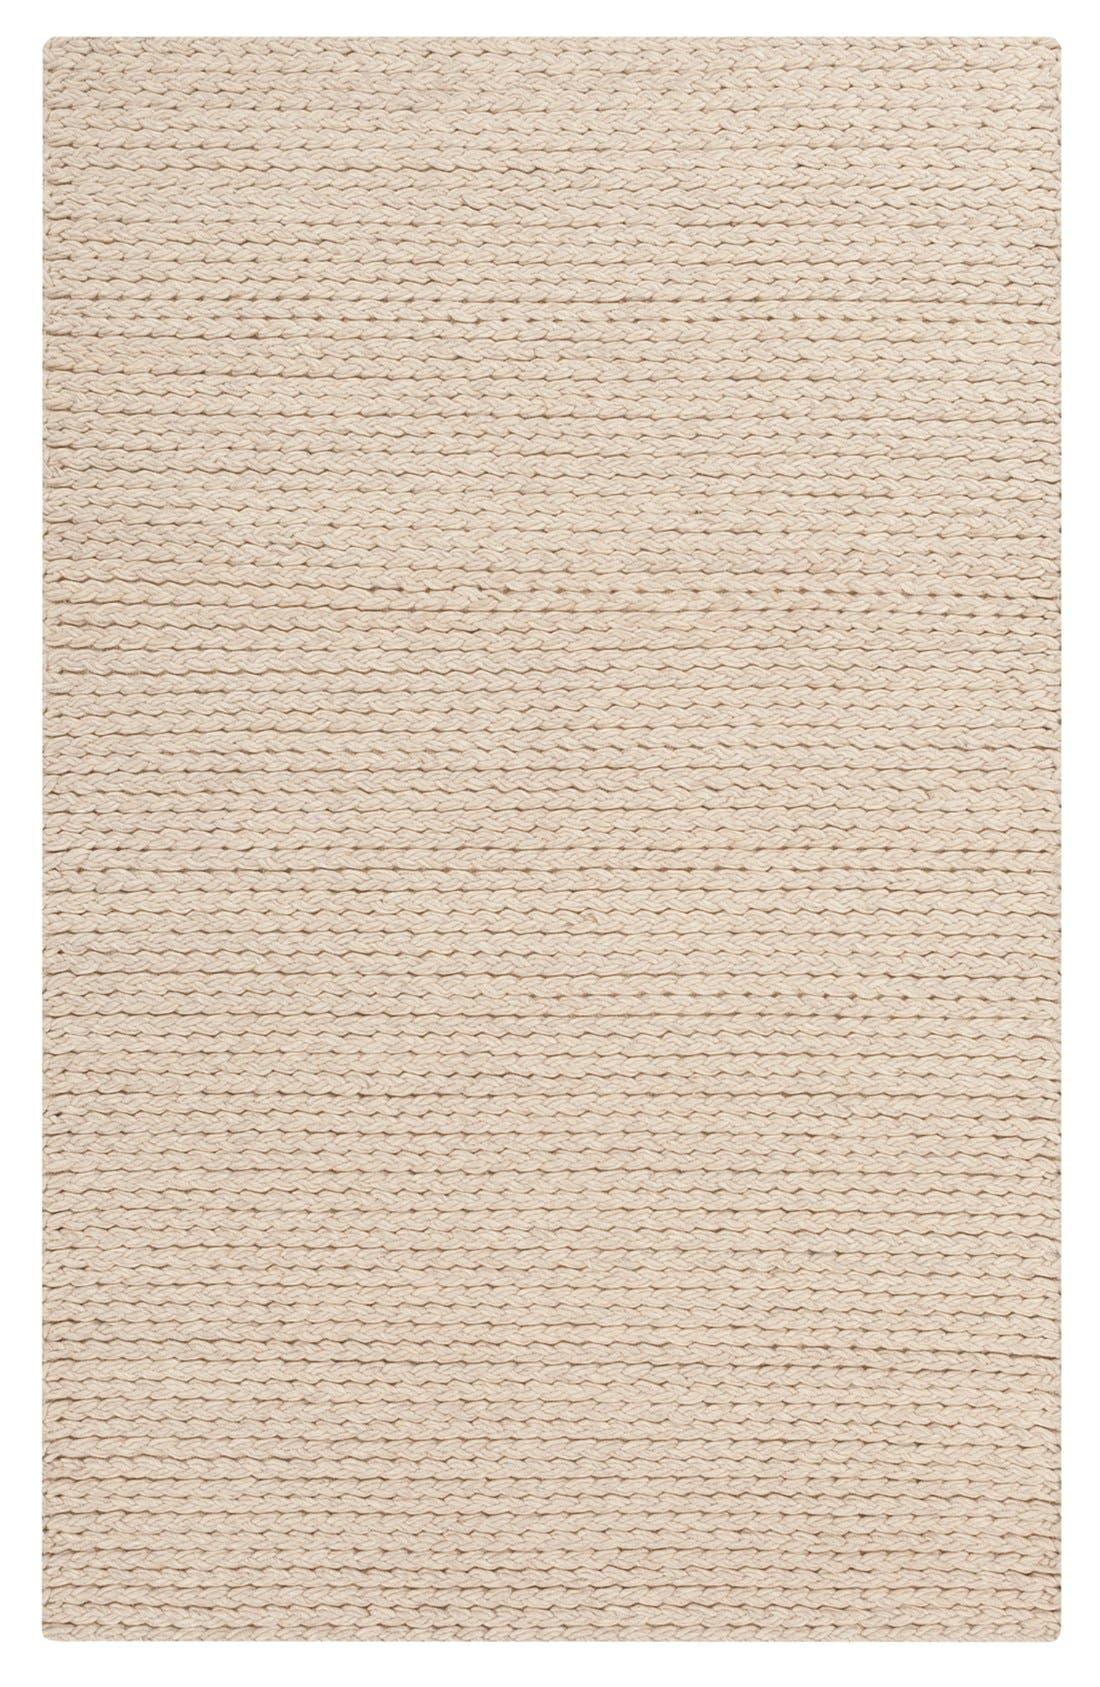 Alternate Image 1 Selected - Surya Home 'Yukon' Hand Woven Wool Rug